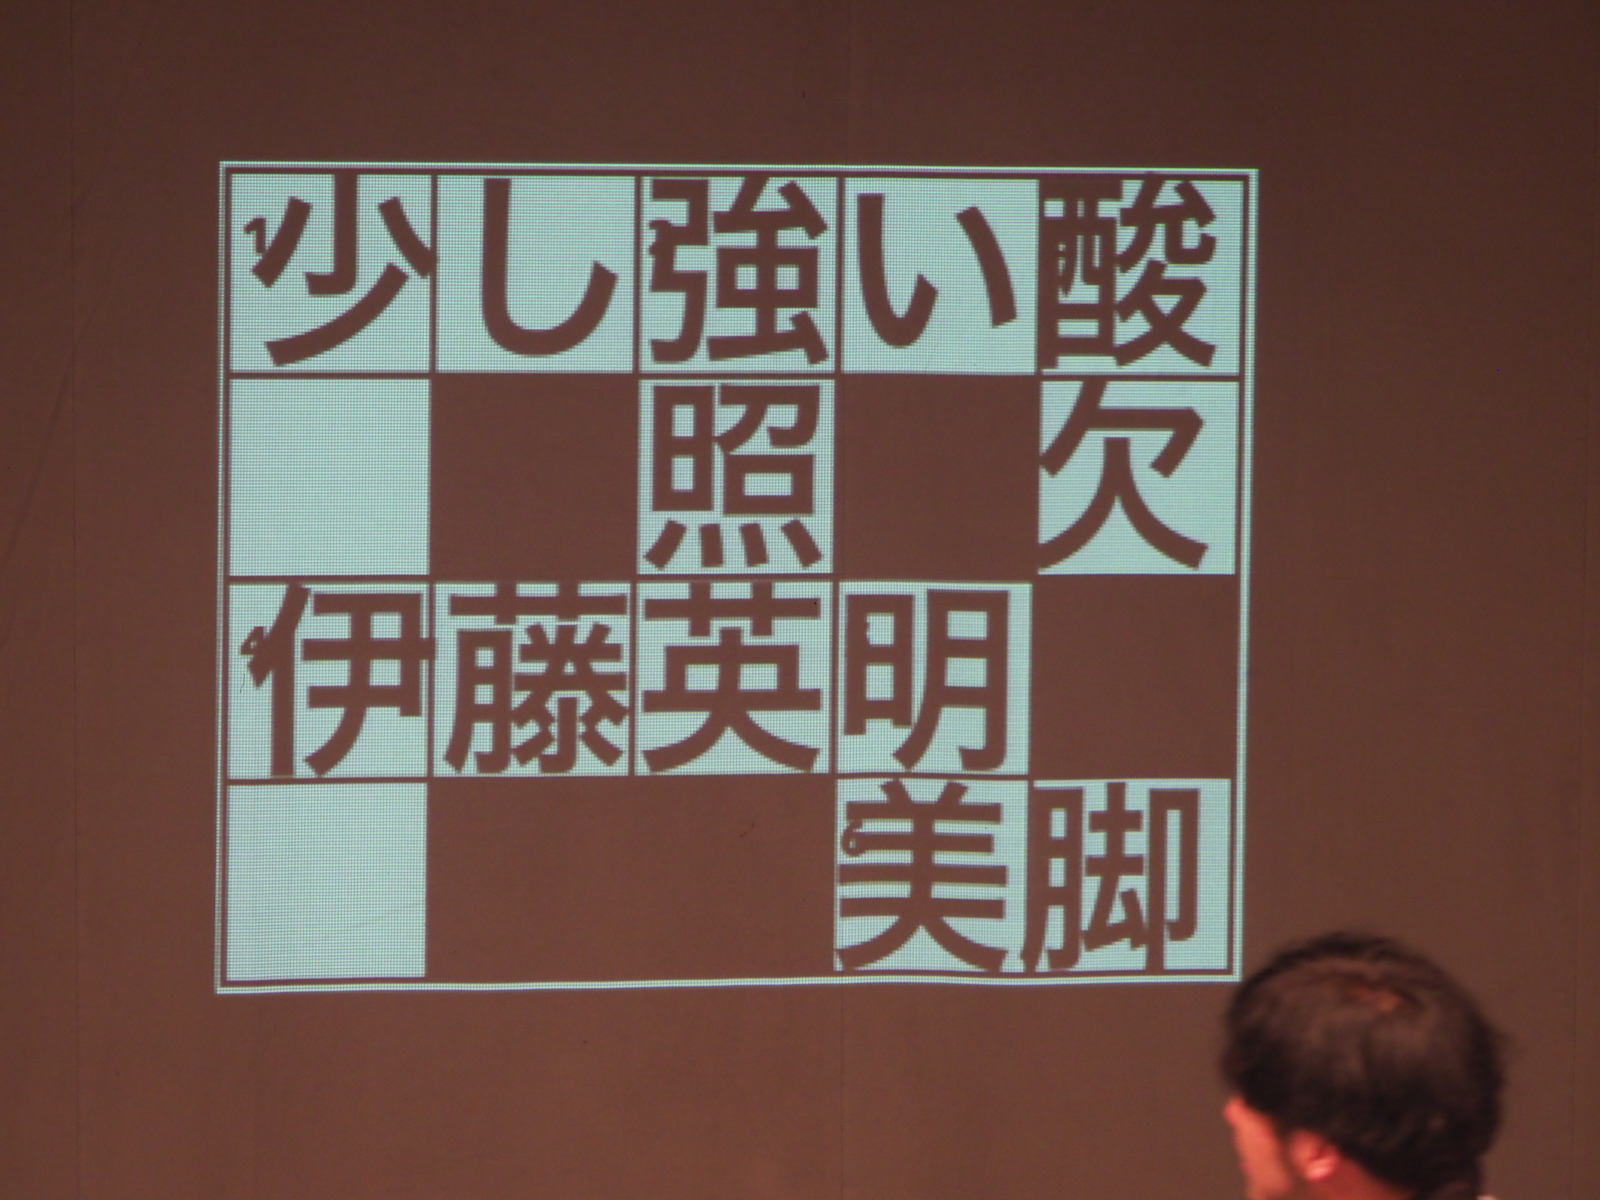 f:id:motomachi24:20170226191849j:plain